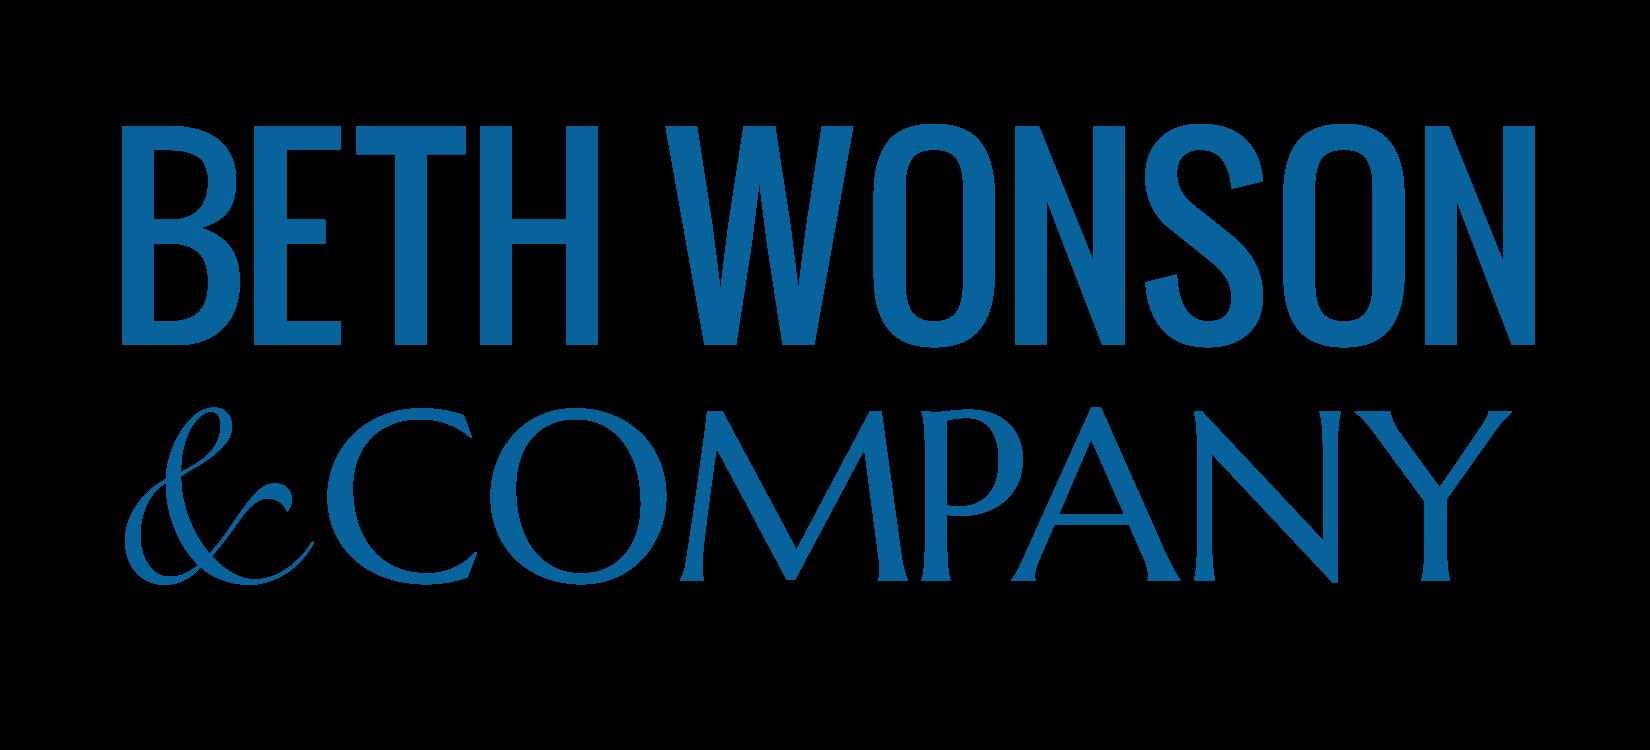 BETH-WONSON-COMPANY-logo-2.png